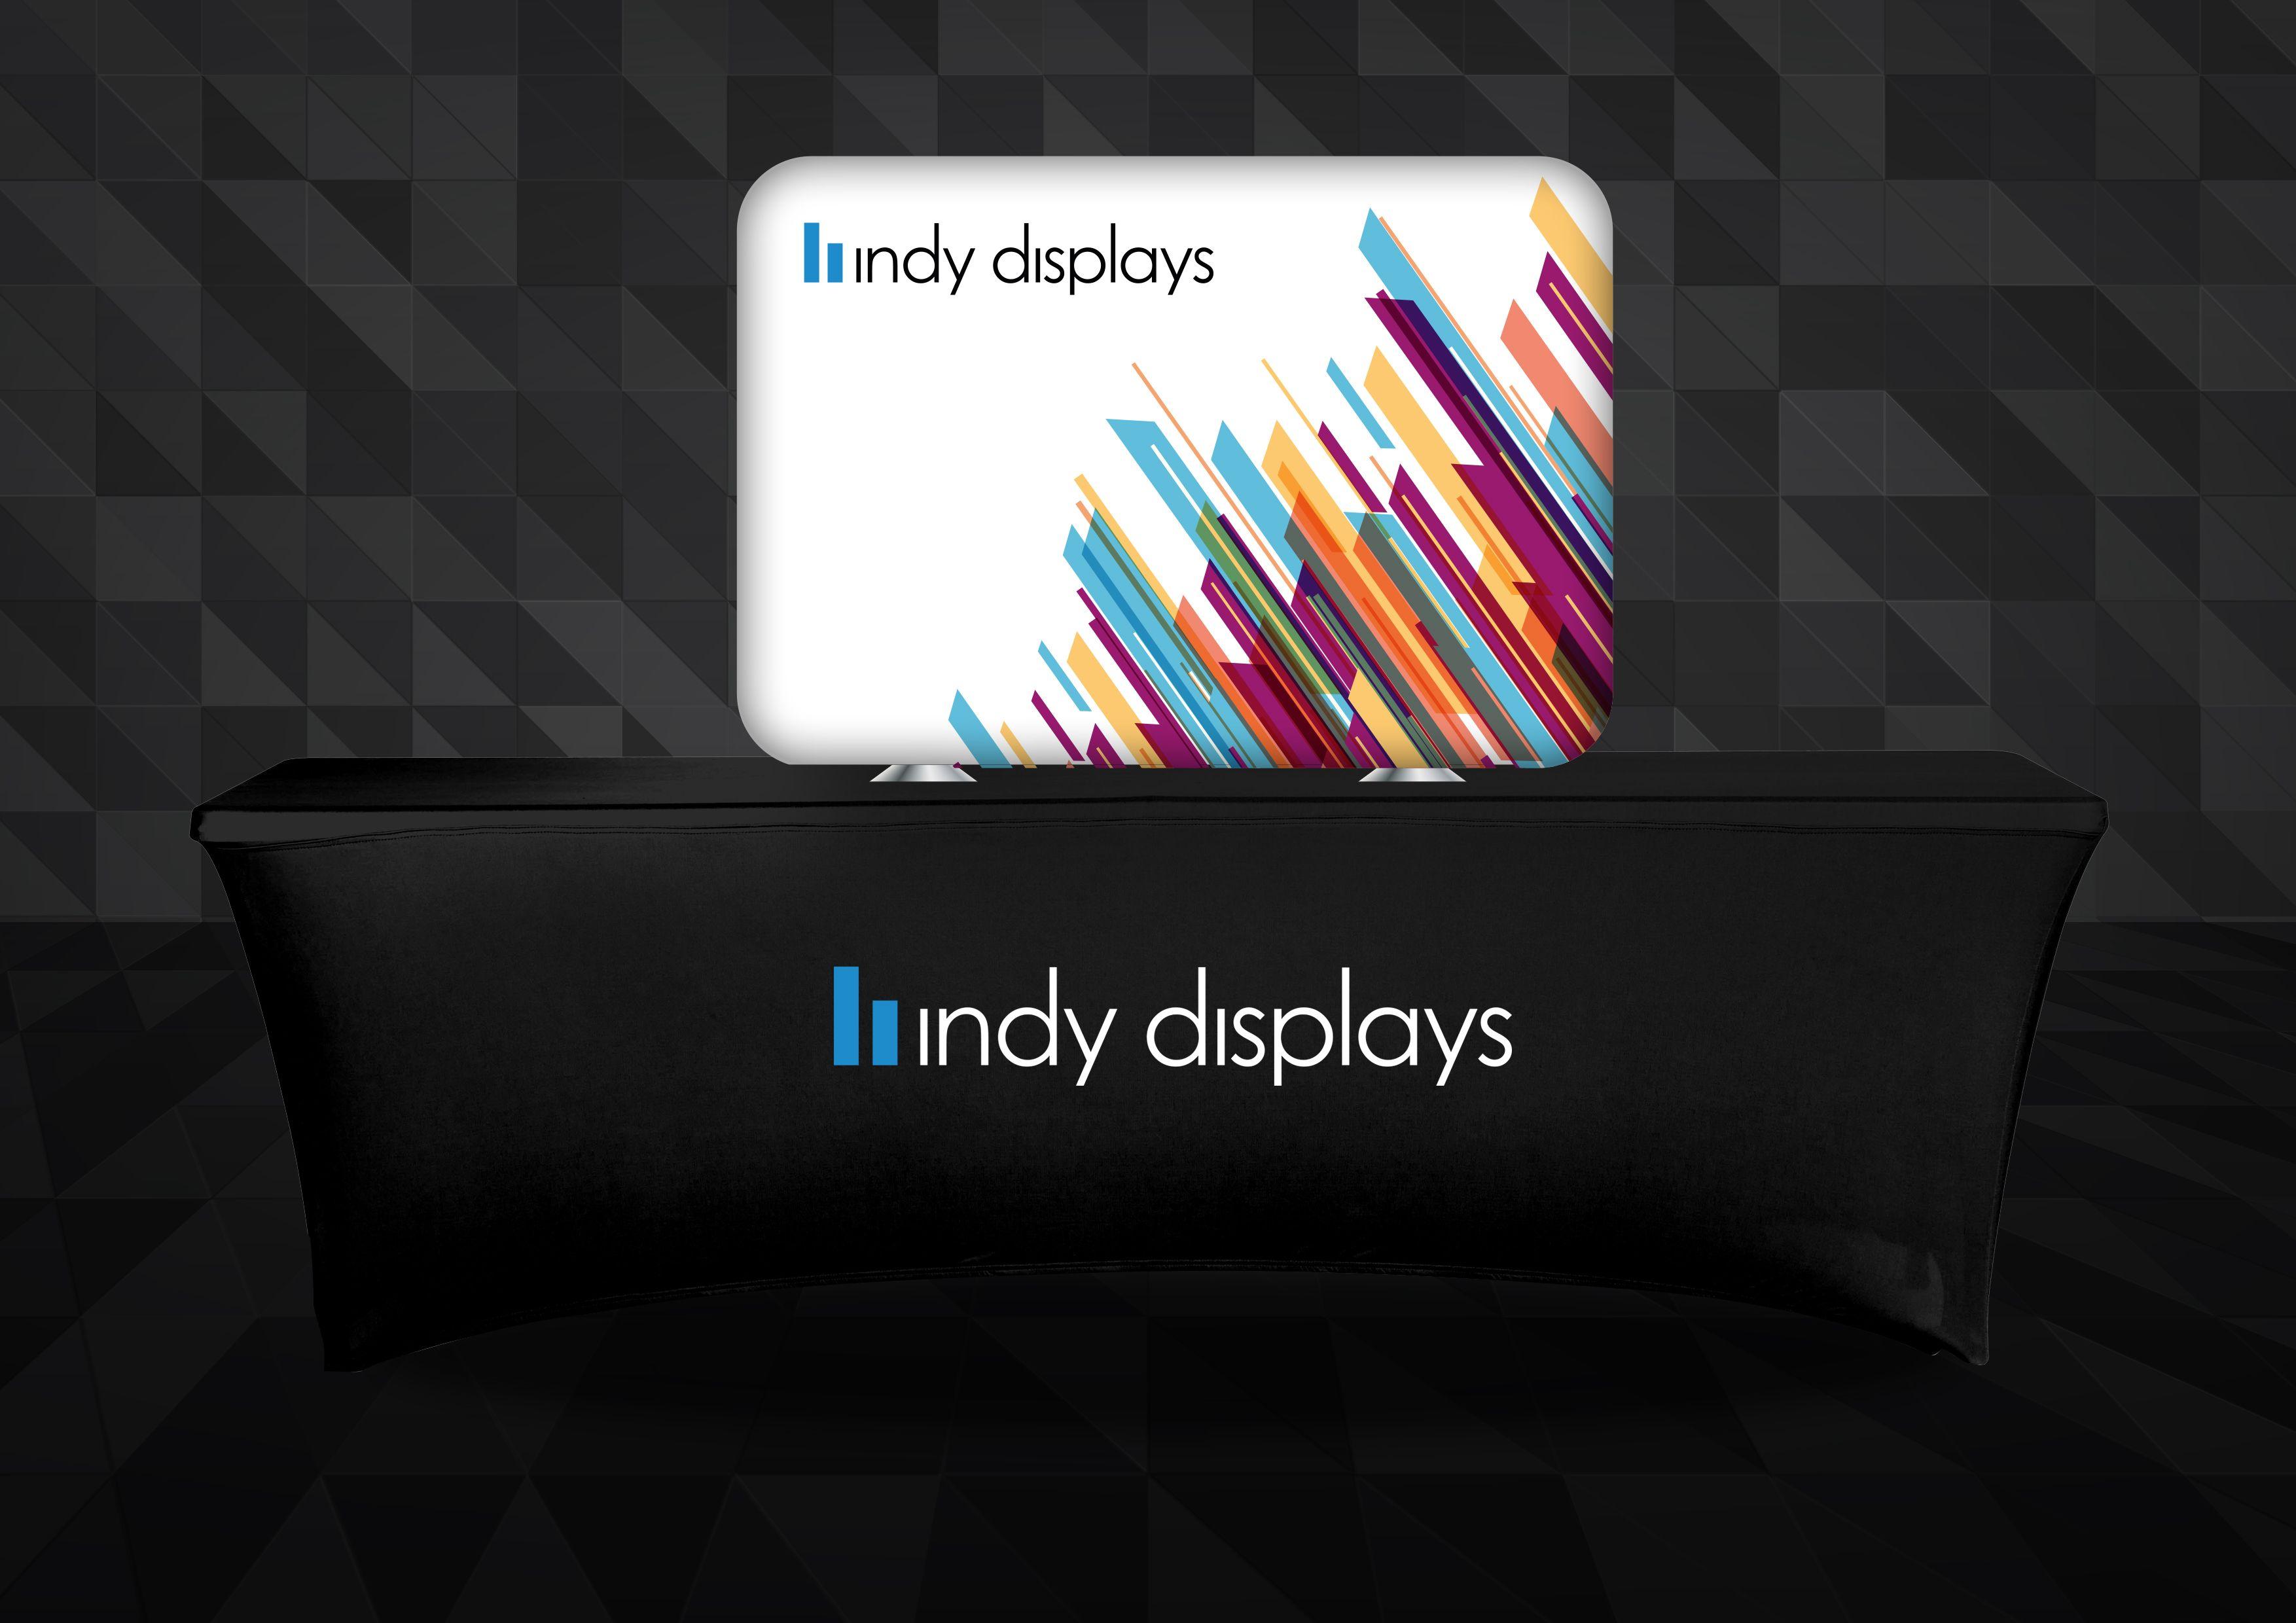 Led Rounded Edge Backlit Light Box Tabletop Display Table Top Display Modern Design Trends Custom Displays